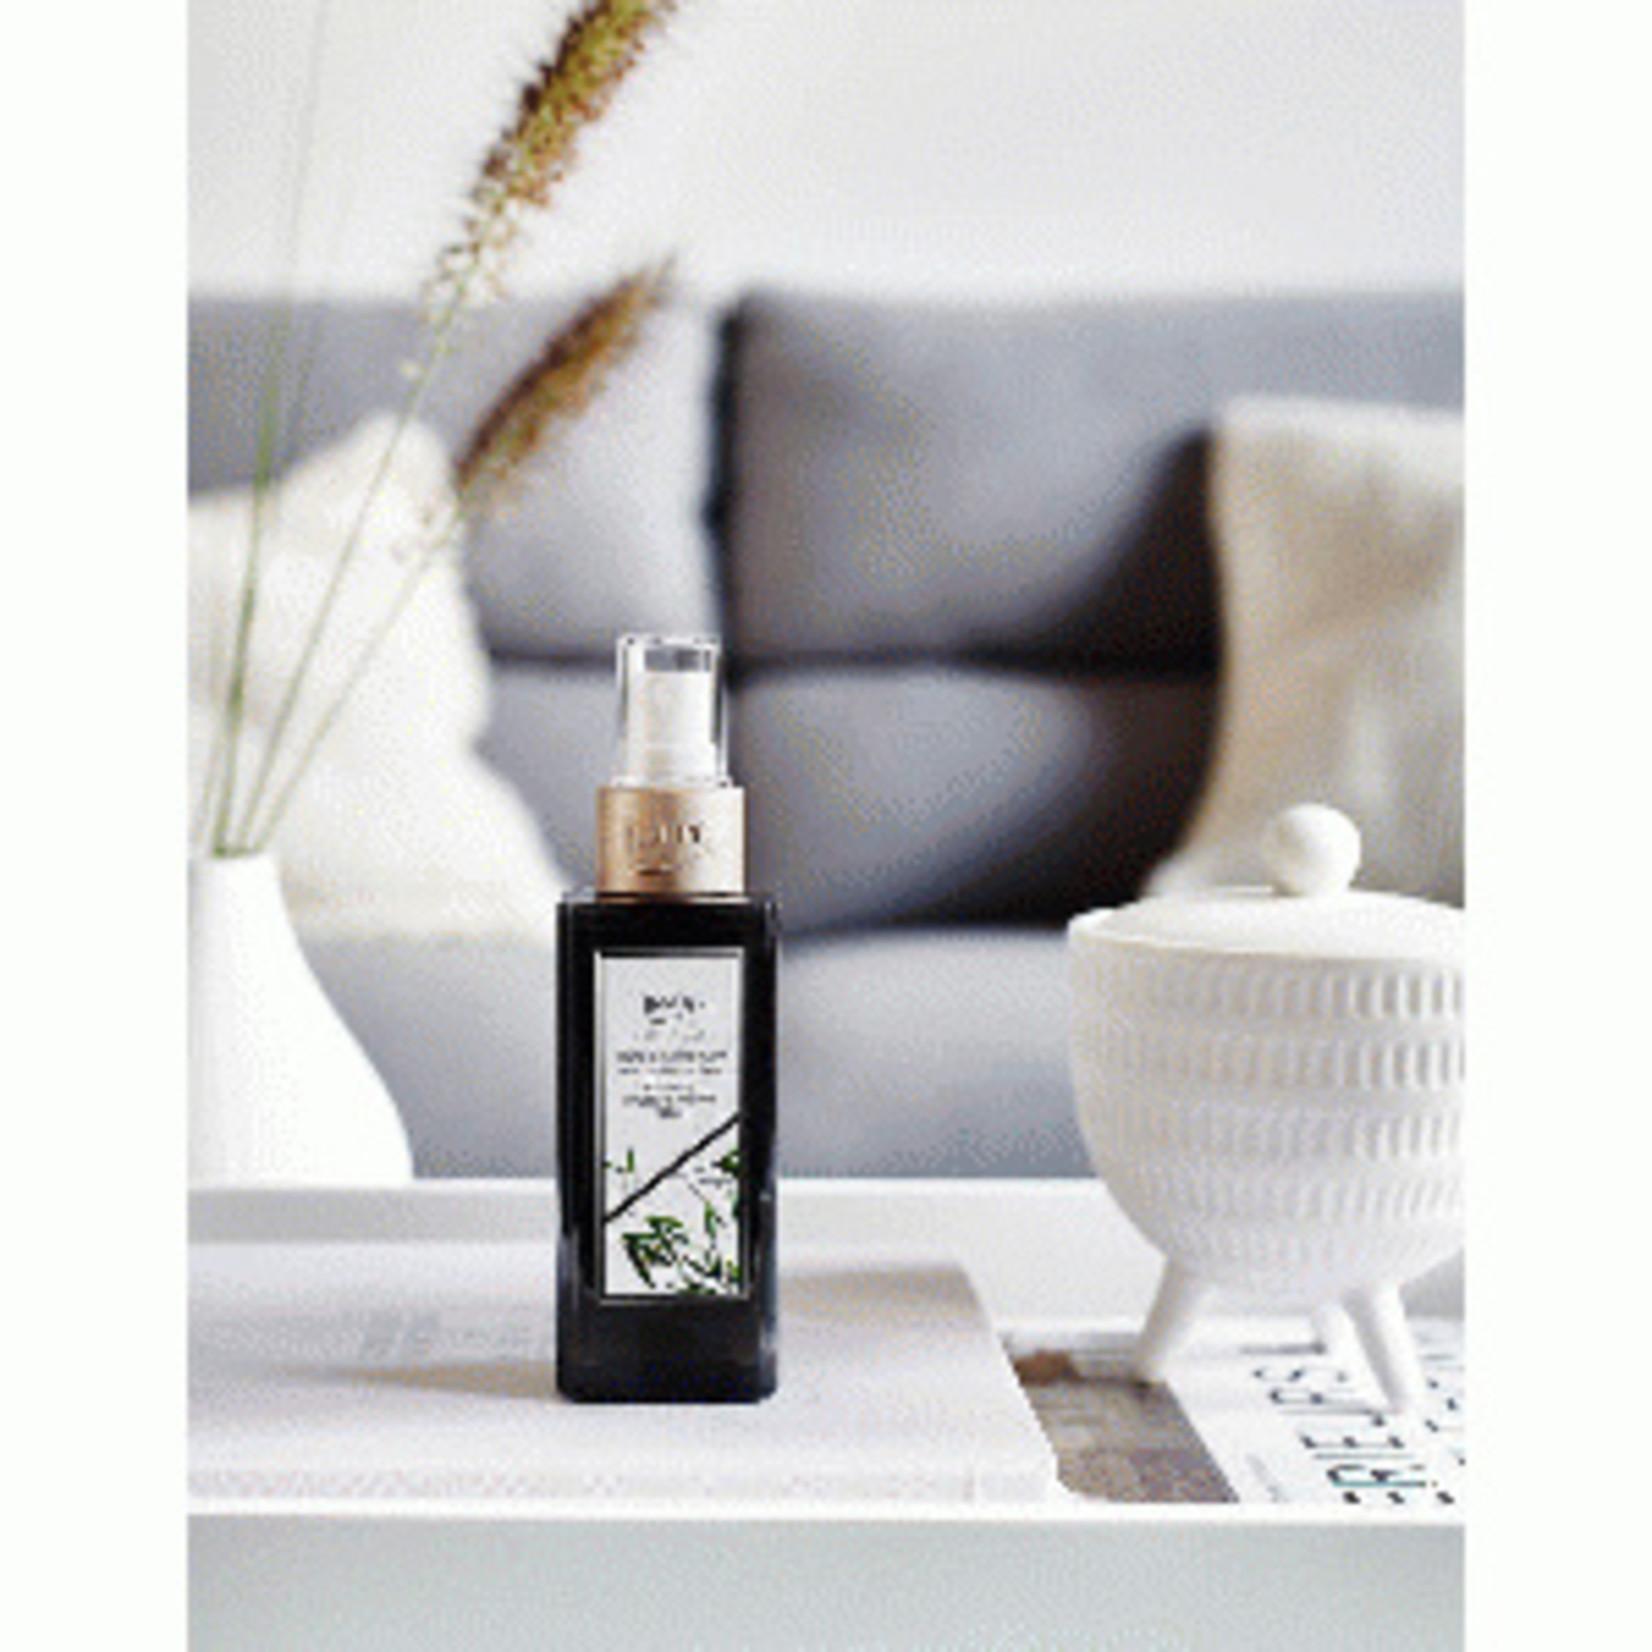 Ipuro Roomspray - Black bamboo - 120ml